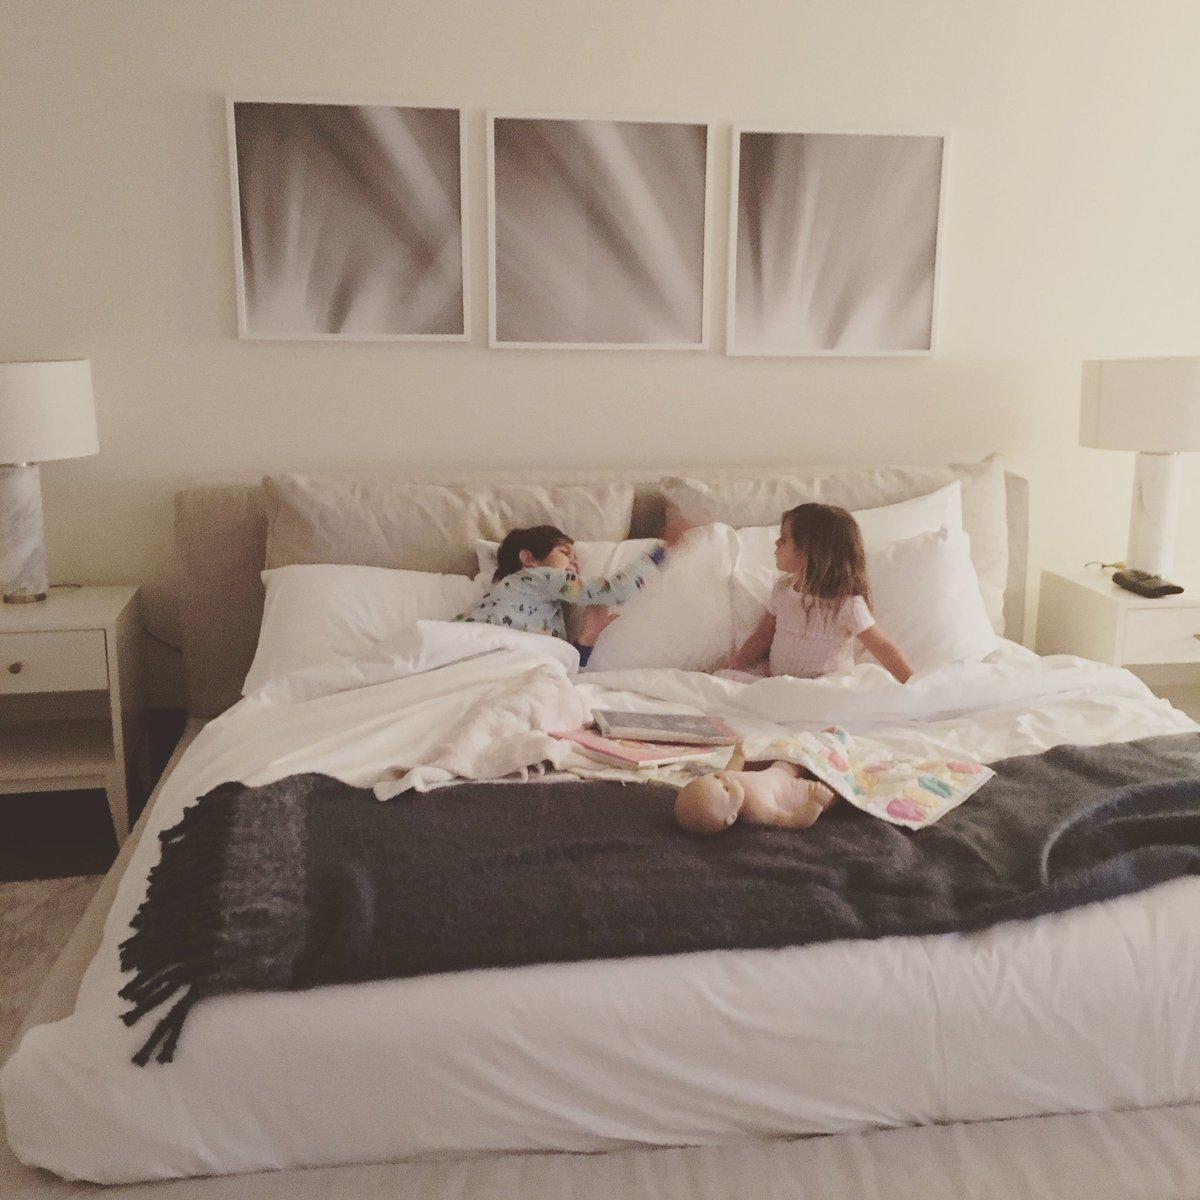 Kourtney Kardashian On Twitter Last Nights Slumber Party - Kourtney kardashian bedroom furniture